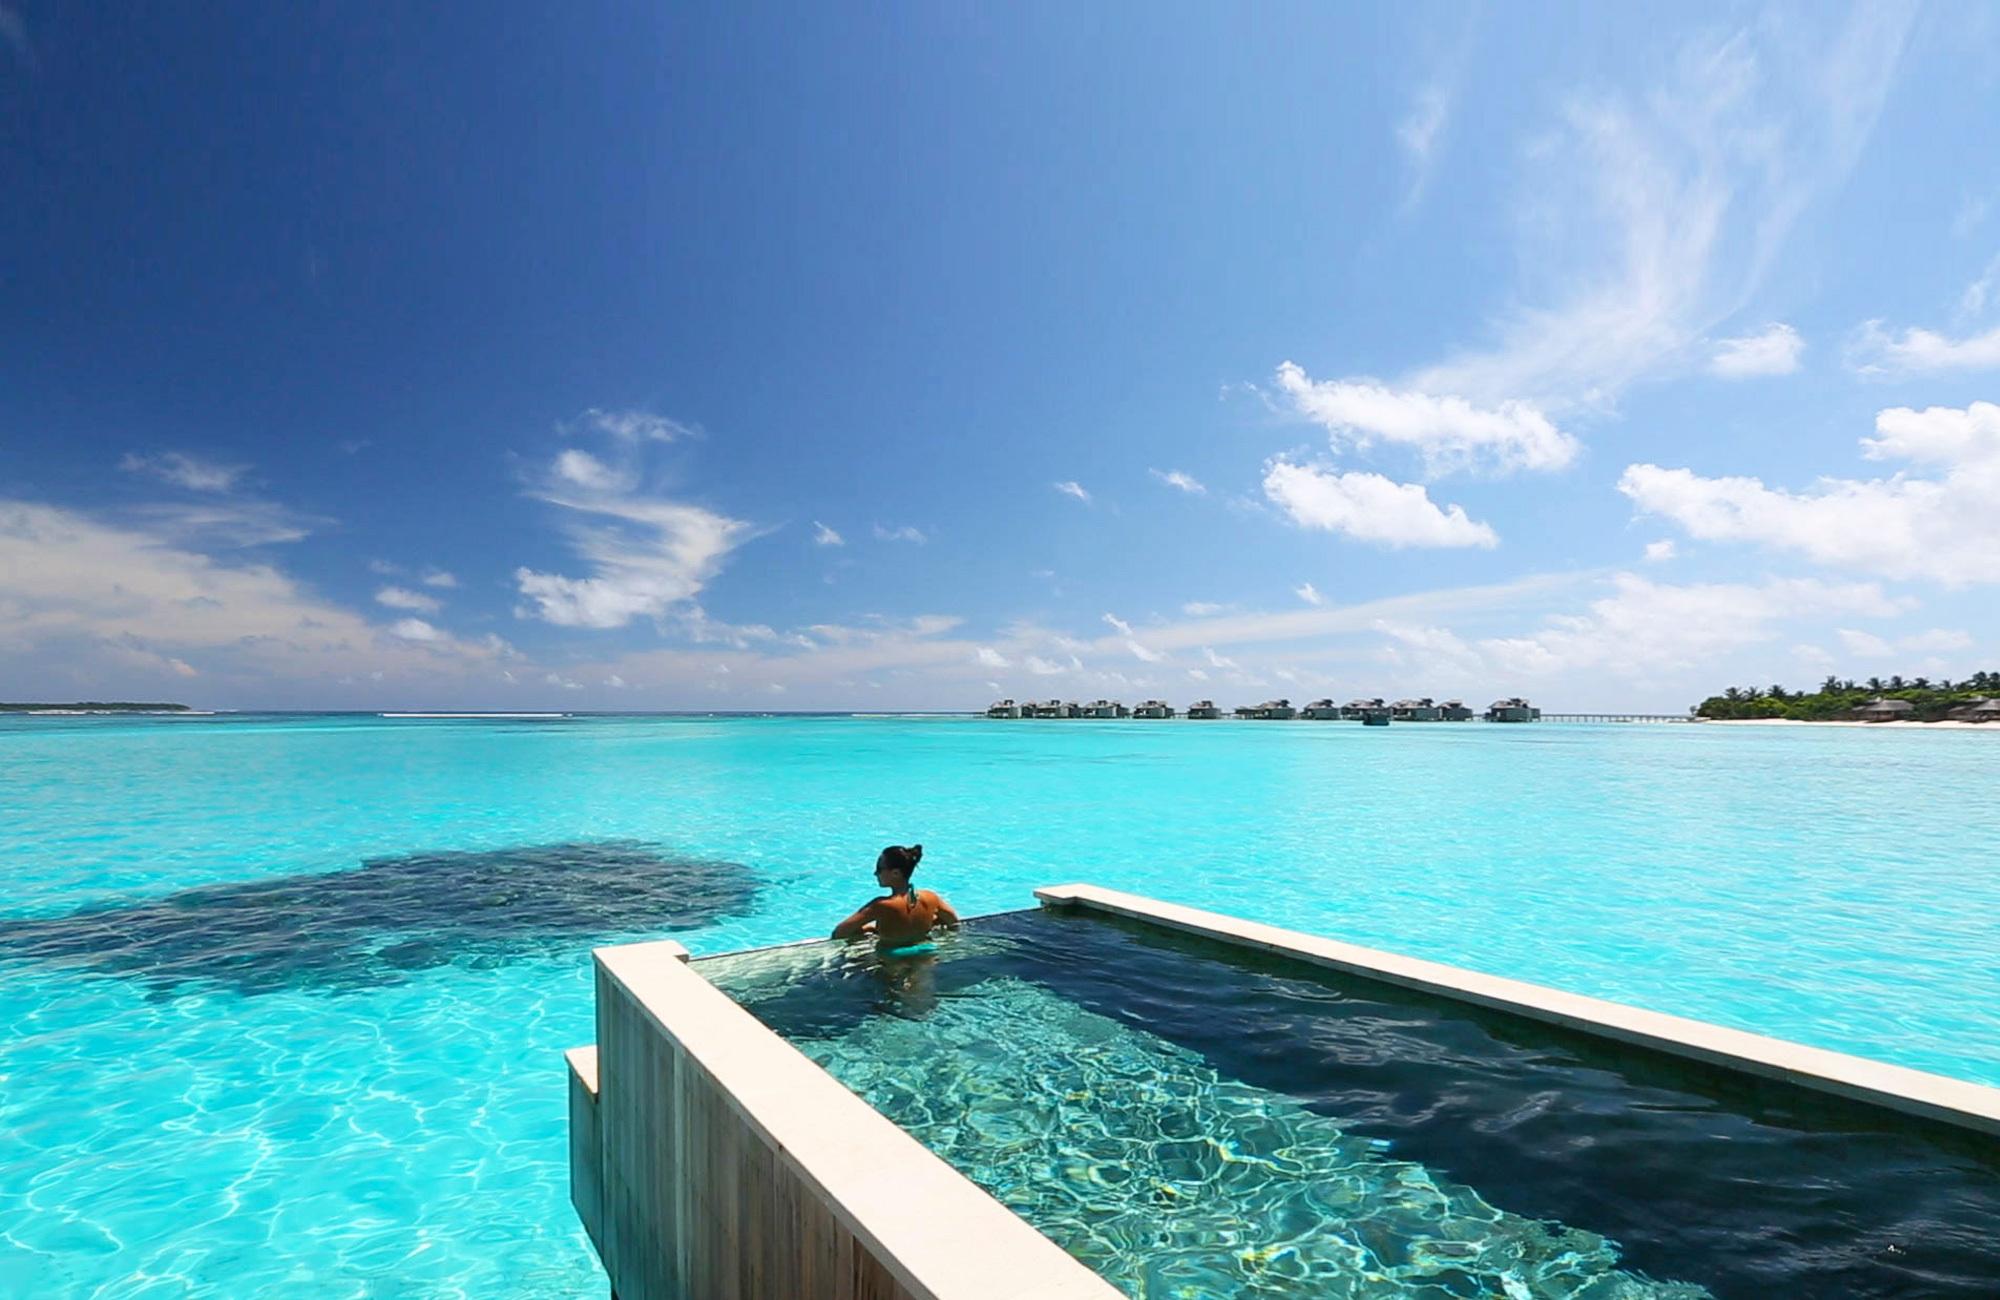 Séjour Maldives - Piscine Six Senses Laamu - Amplitudes